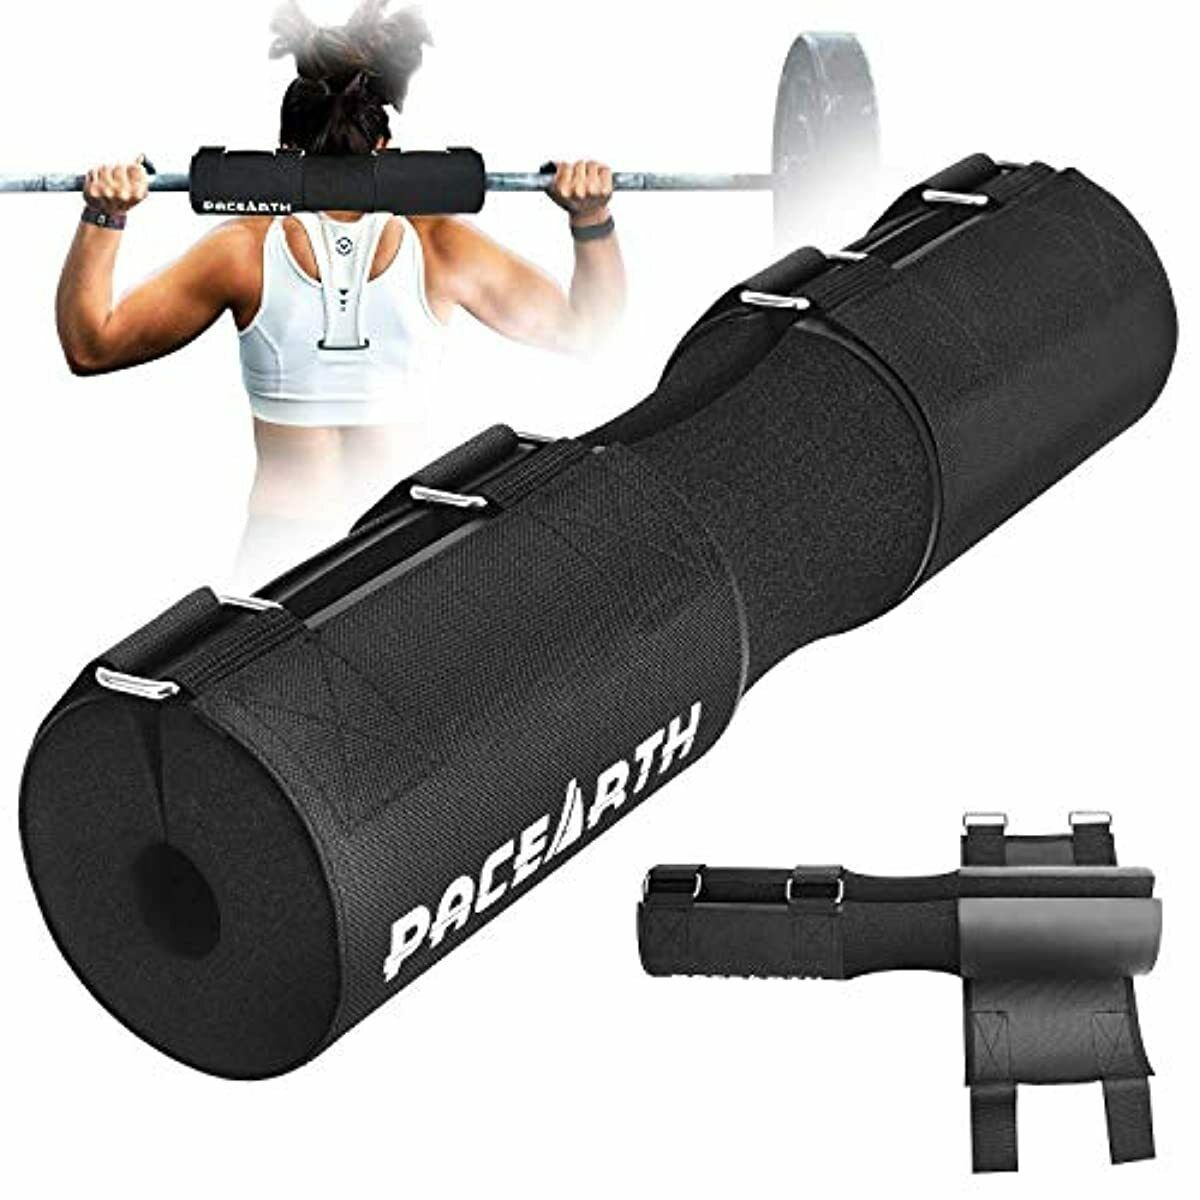 De Aser Ejercicio Equipment Gym Squat Rack Accessories I Bar